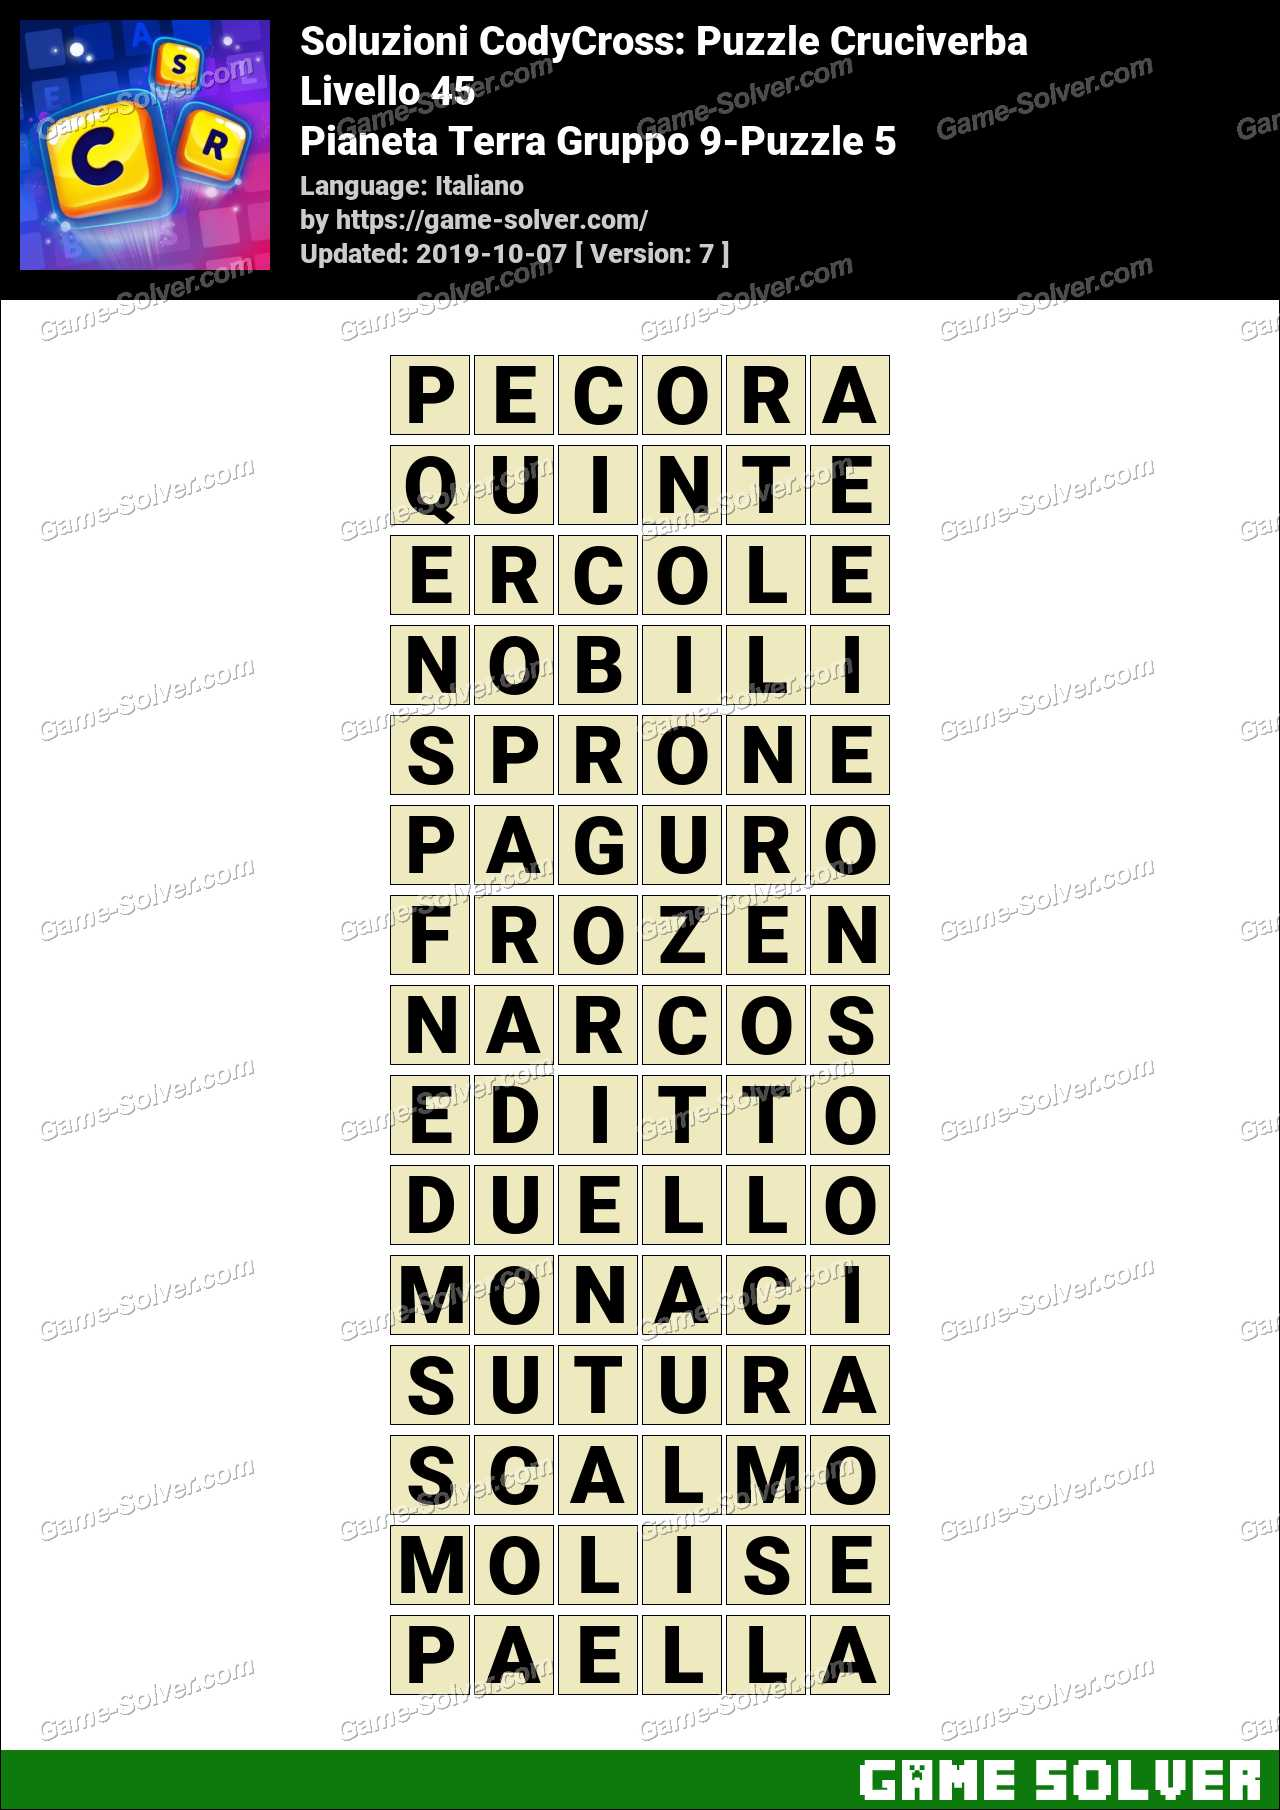 Soluzioni CodyCross Pianeta Terra Gruppo 9-Puzzle 5